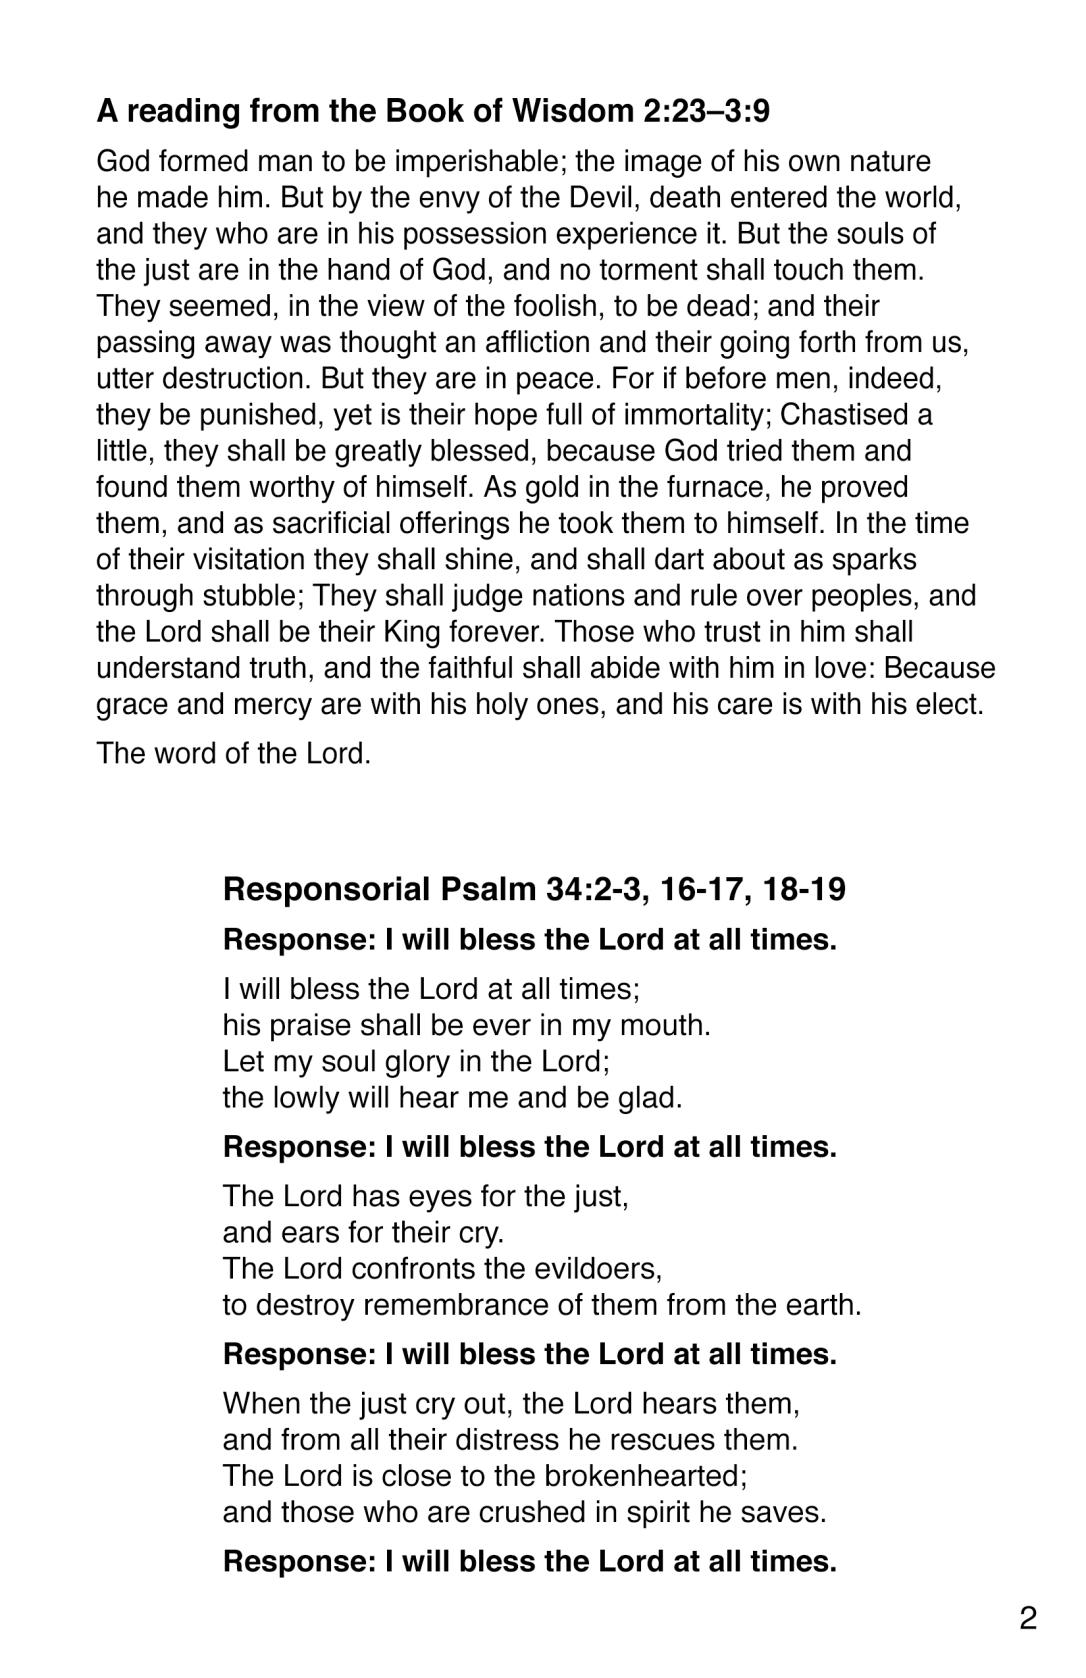 p2, 11-12-19